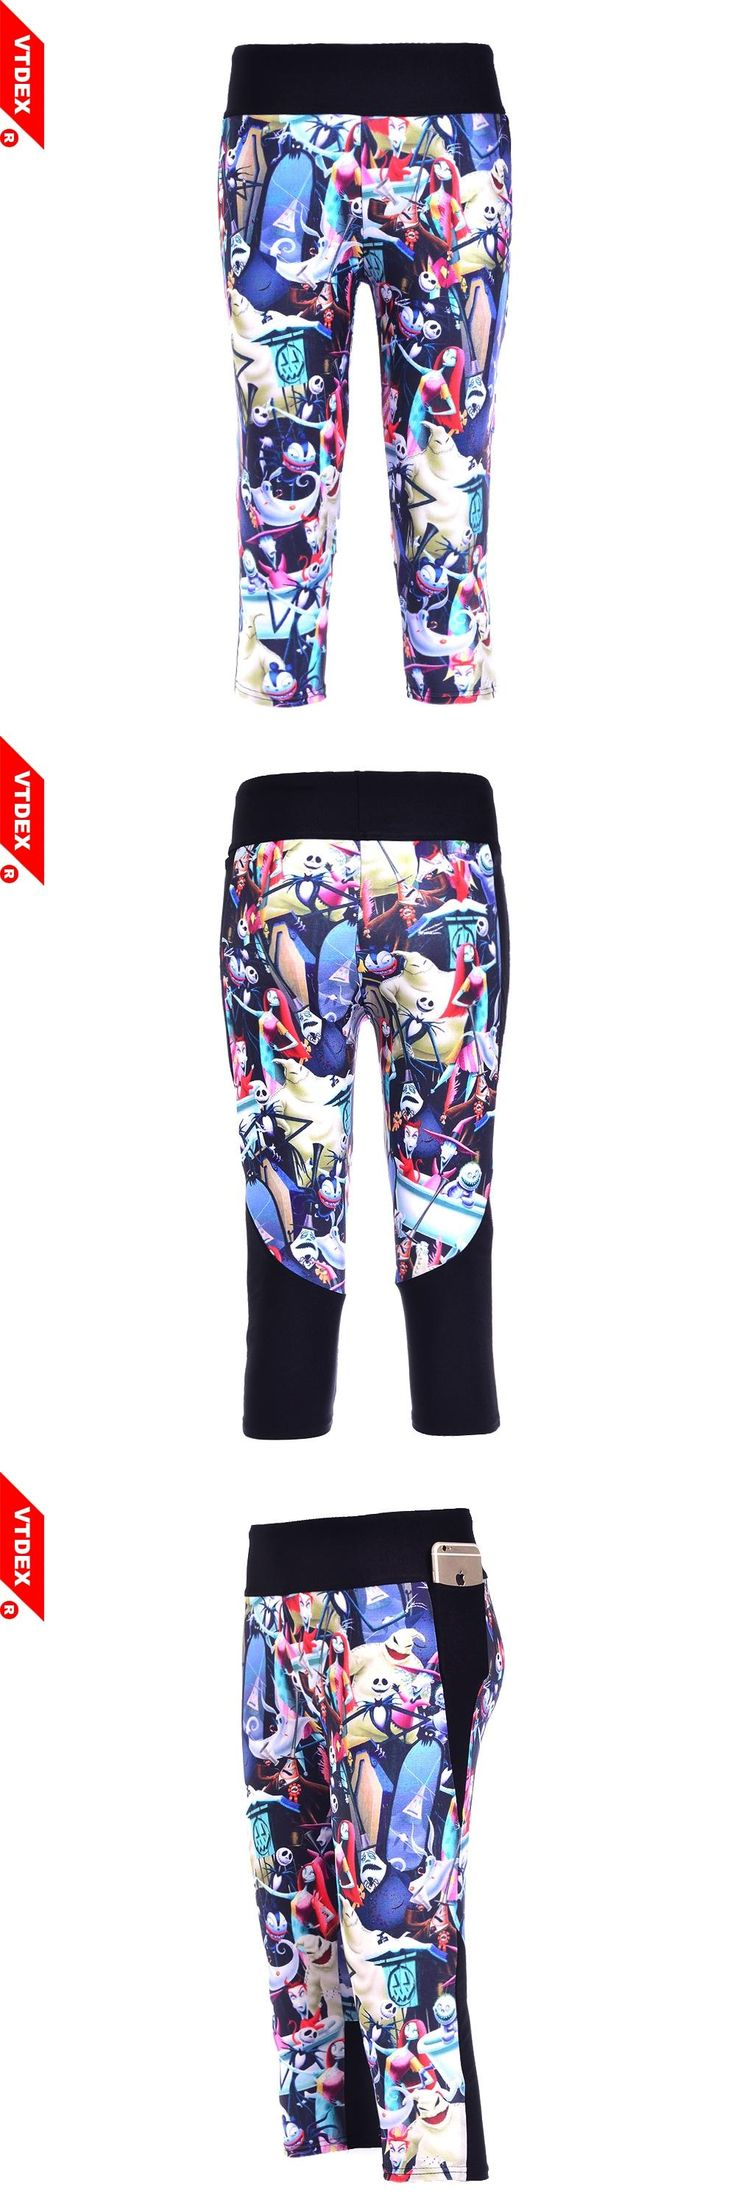 [Visit to Buy] VTDEX Yoga Pants Capri Women Digital Printed Fitness Sport Leggings Workout Elastic Skinny Running Tight Mallas Mujer Deportivas #Advertisement